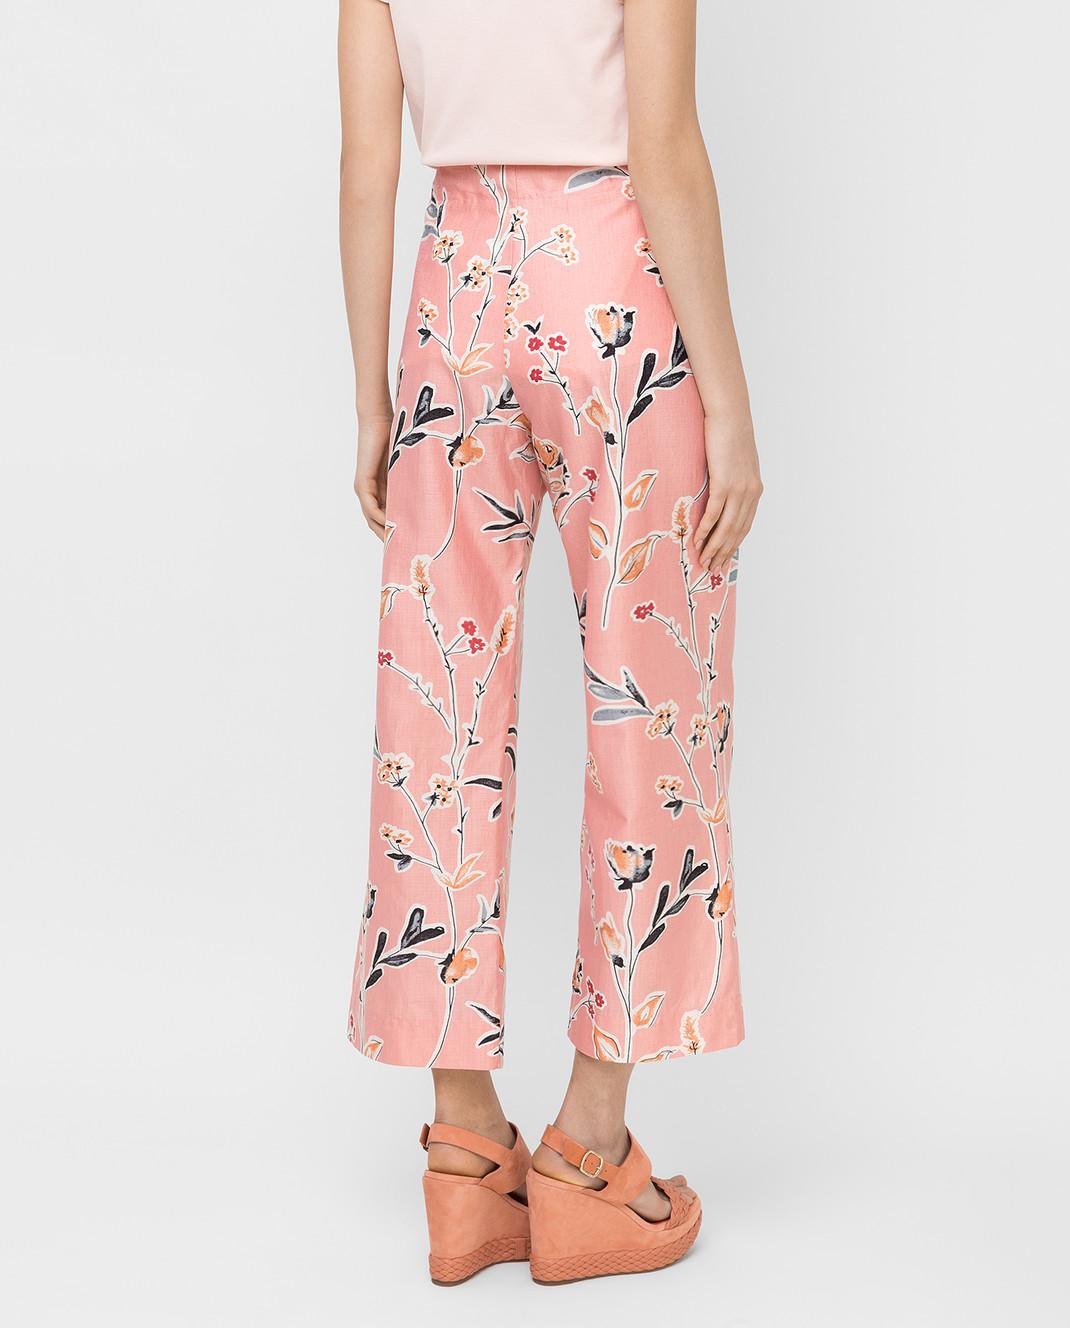 Marni Розовые брюки PAMAR02A00TCR58 изображение 4